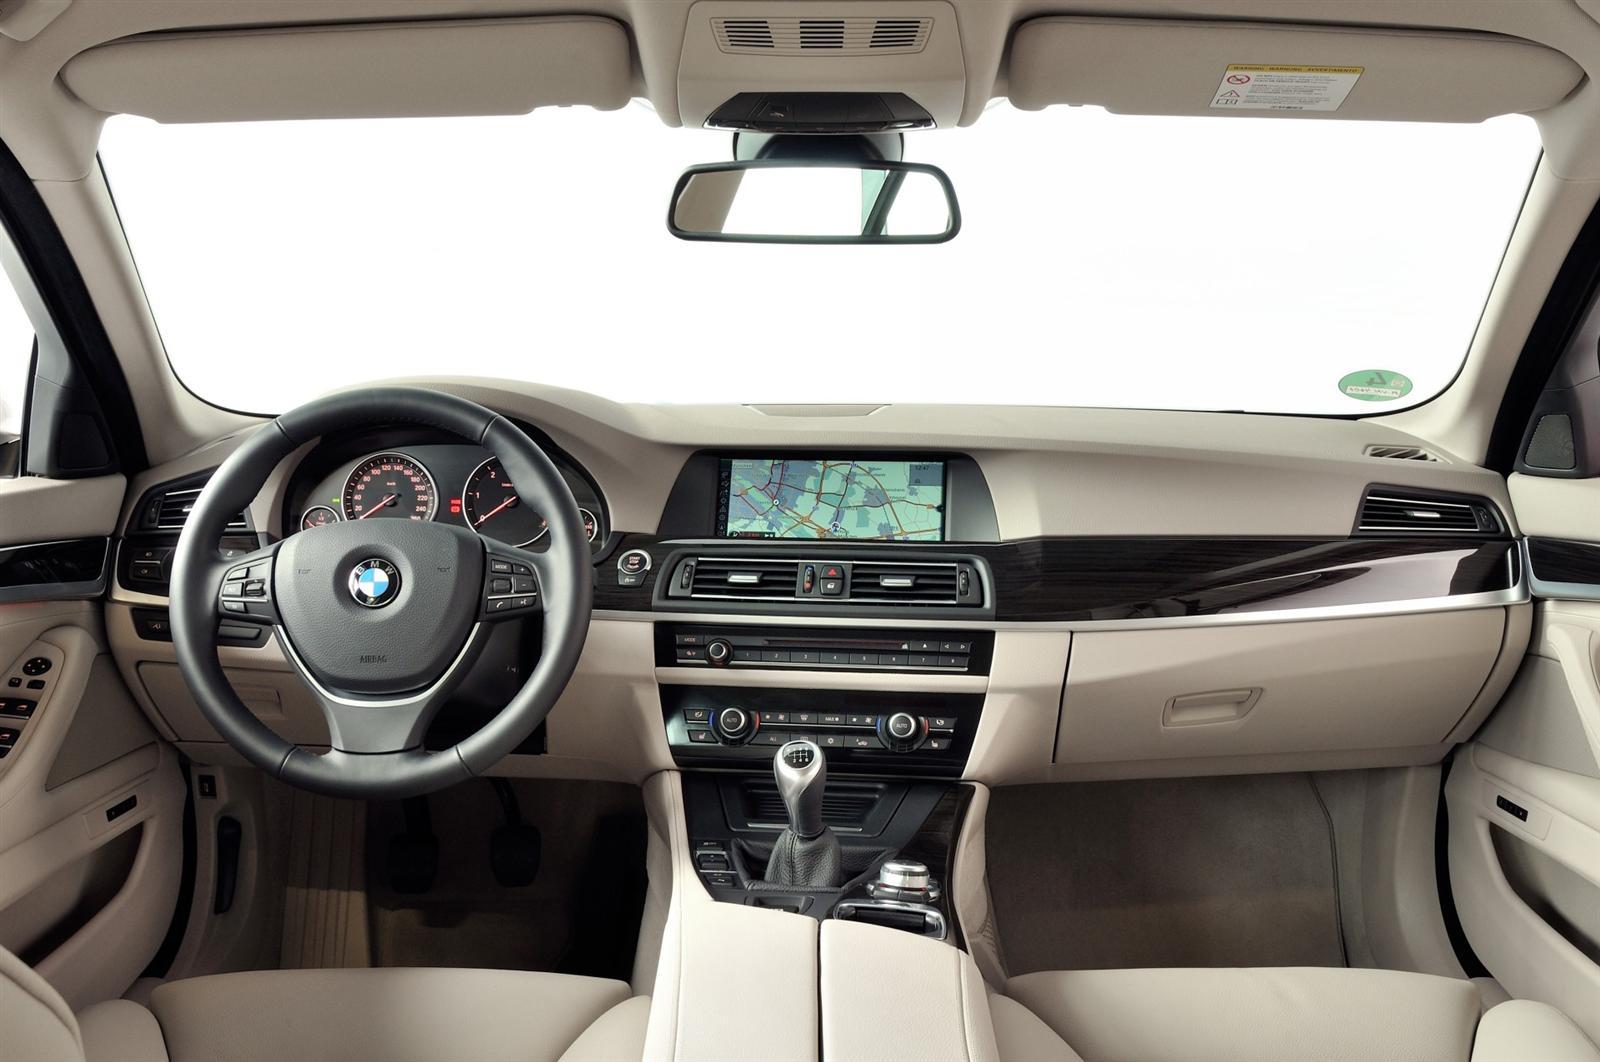 2011 BMW 5 Series Touring Image. https://www.conceptcarz.com/images ...